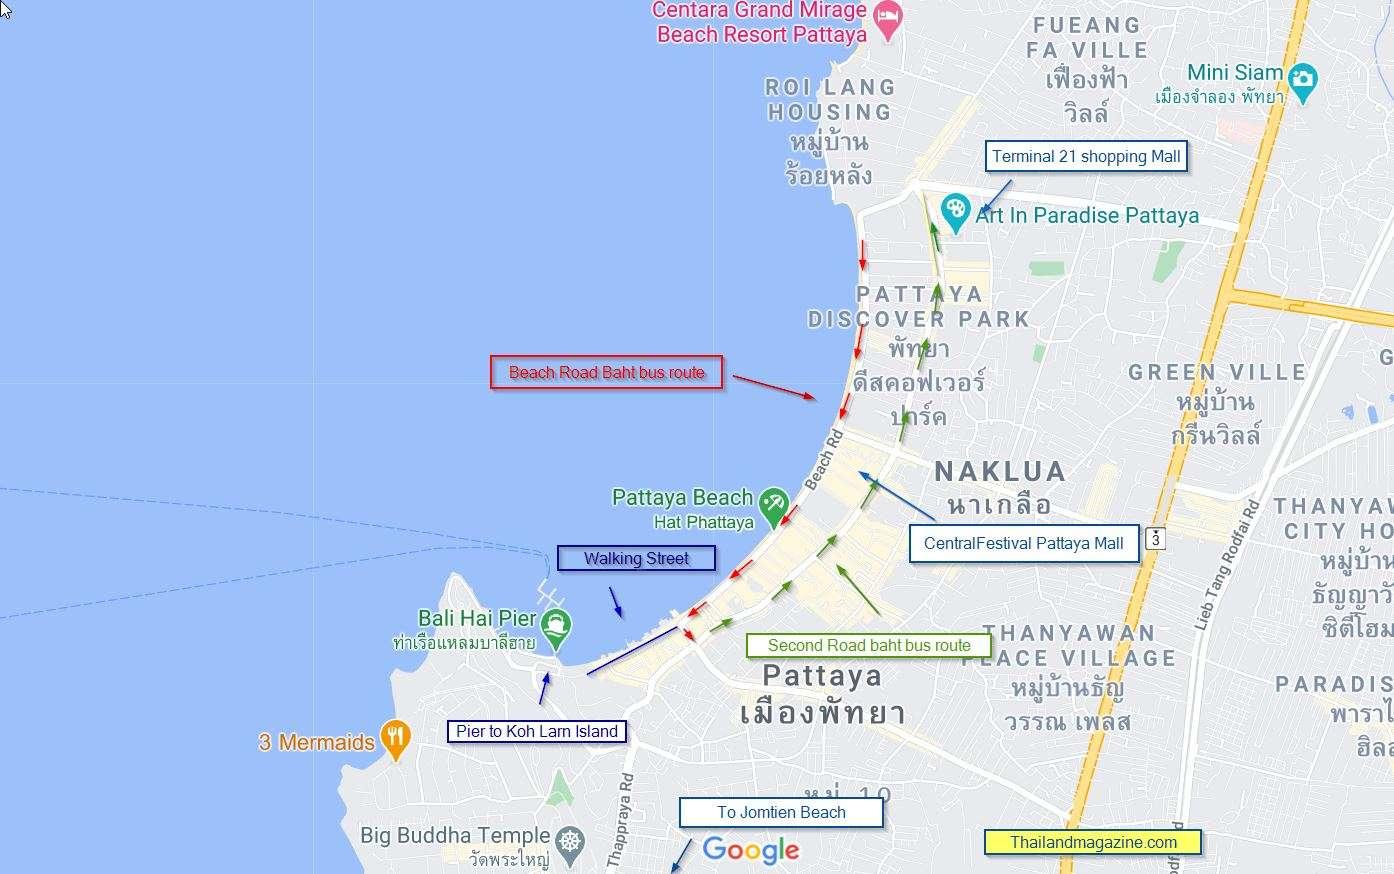 baht bus / Songthaew route kaart Pattaya